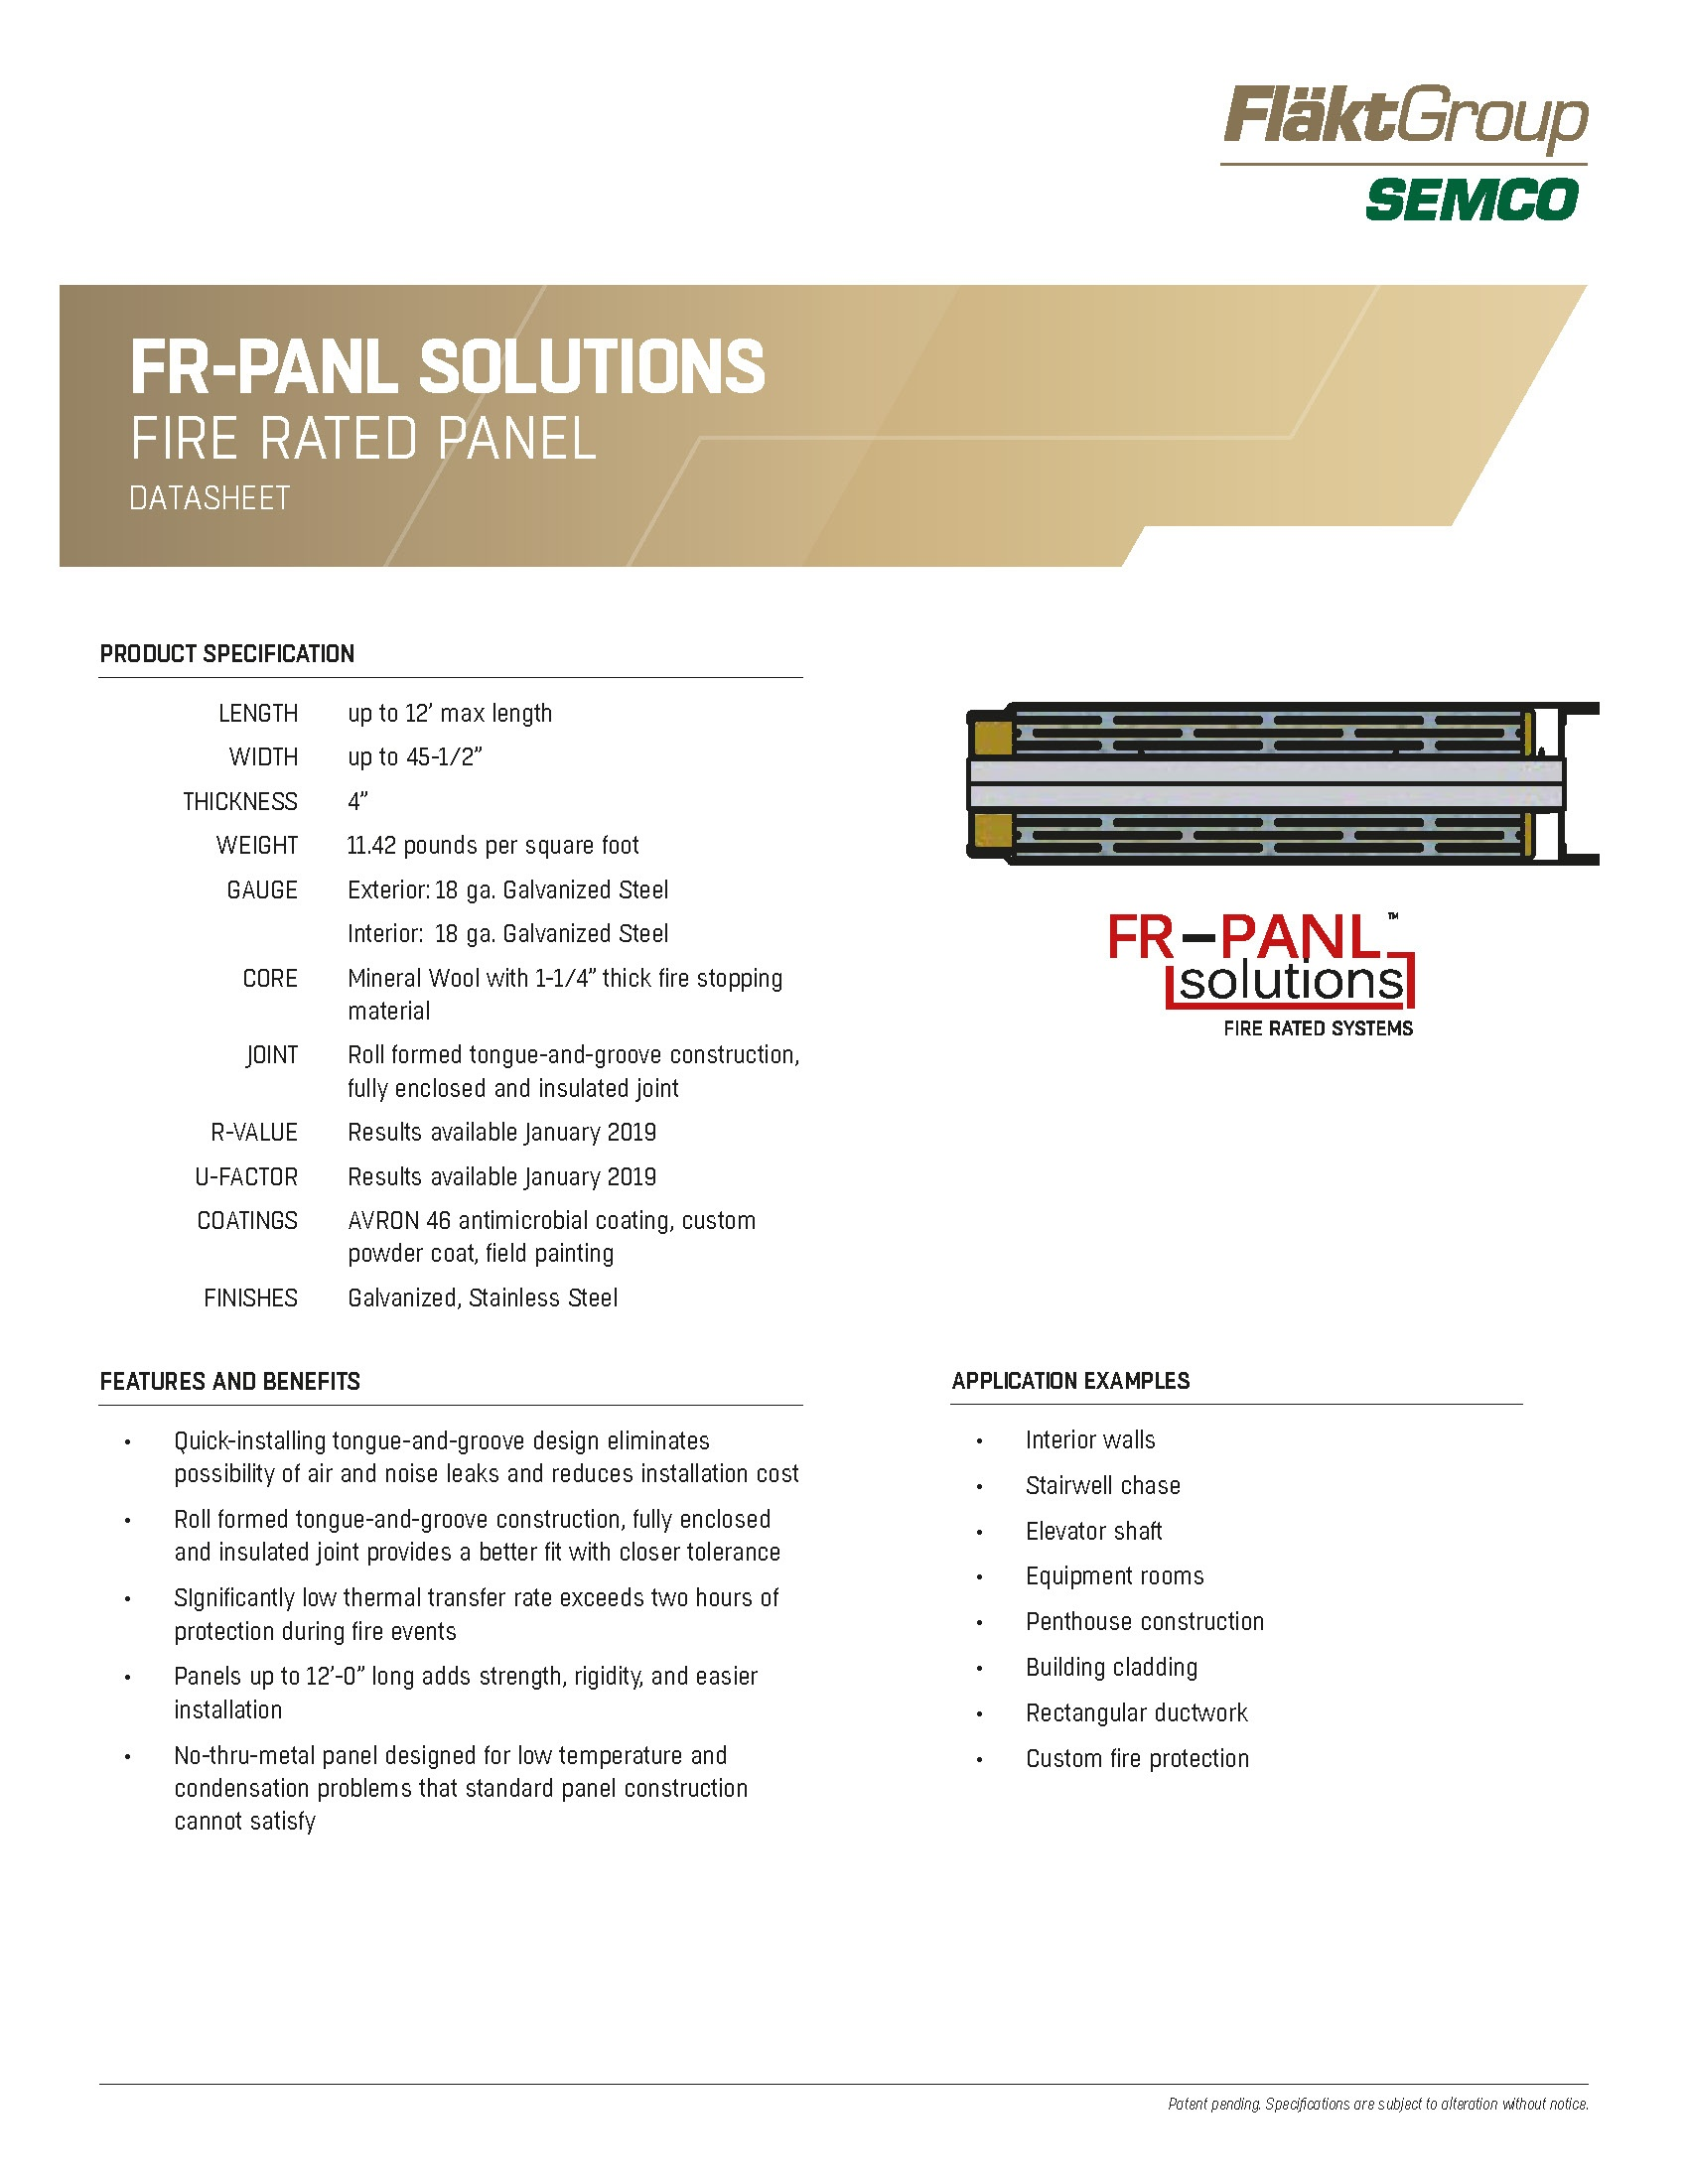 Fire Rated Panels 2pg Technical Datasheet - FlaktGroup Semco 2018-11_Page_1.jpg